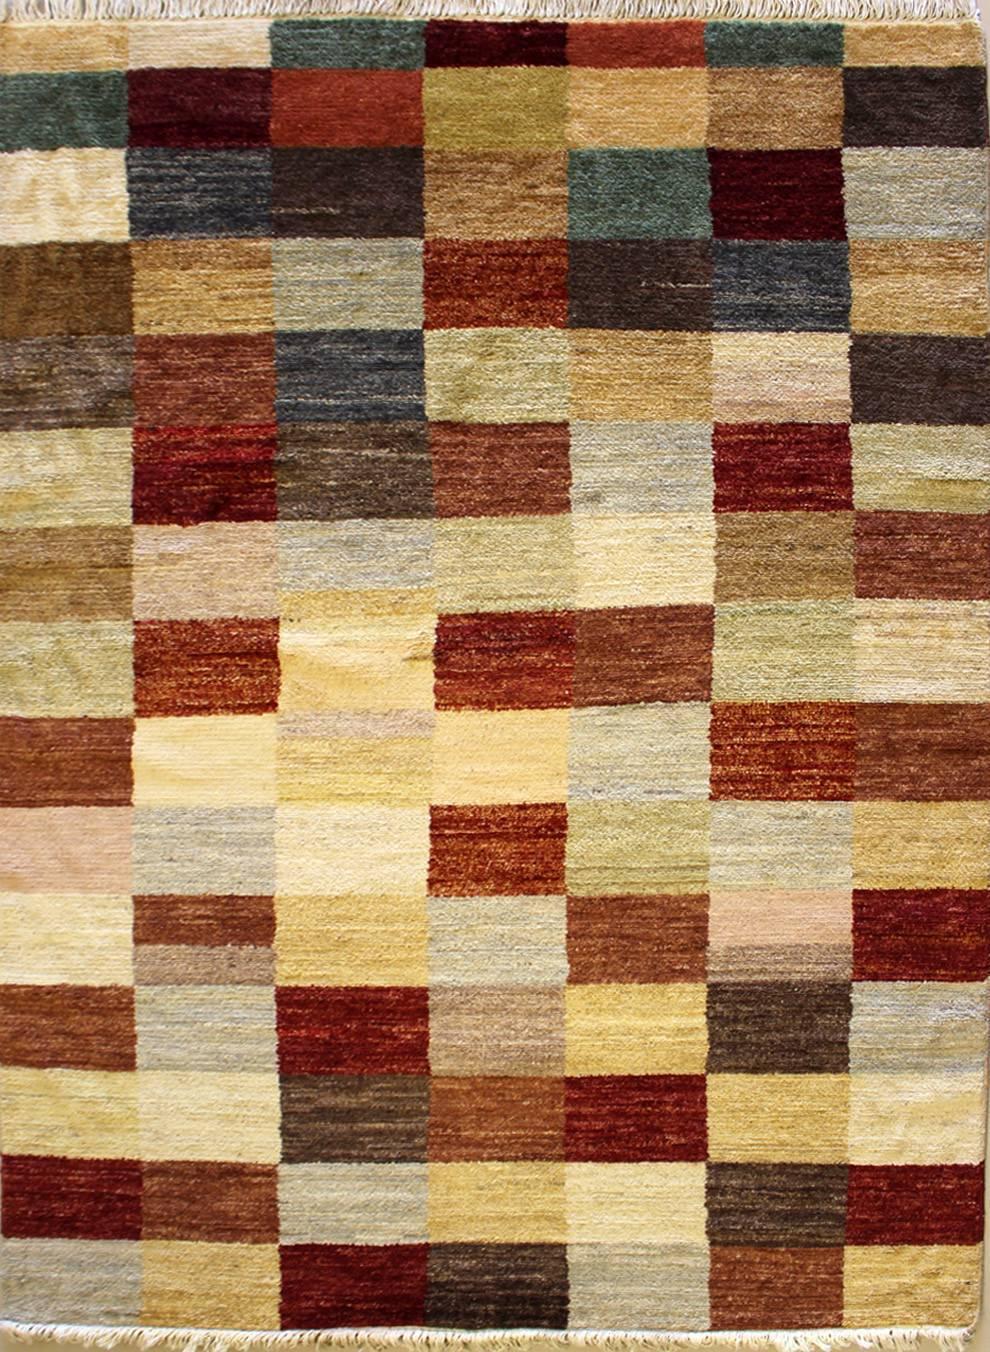 Rugstc Rugstc Rugstc 4.5x7  Gabbeh MulticolGoldt Area Rug,Genuine Hand-Knotted, Wool Pile c5fd4c